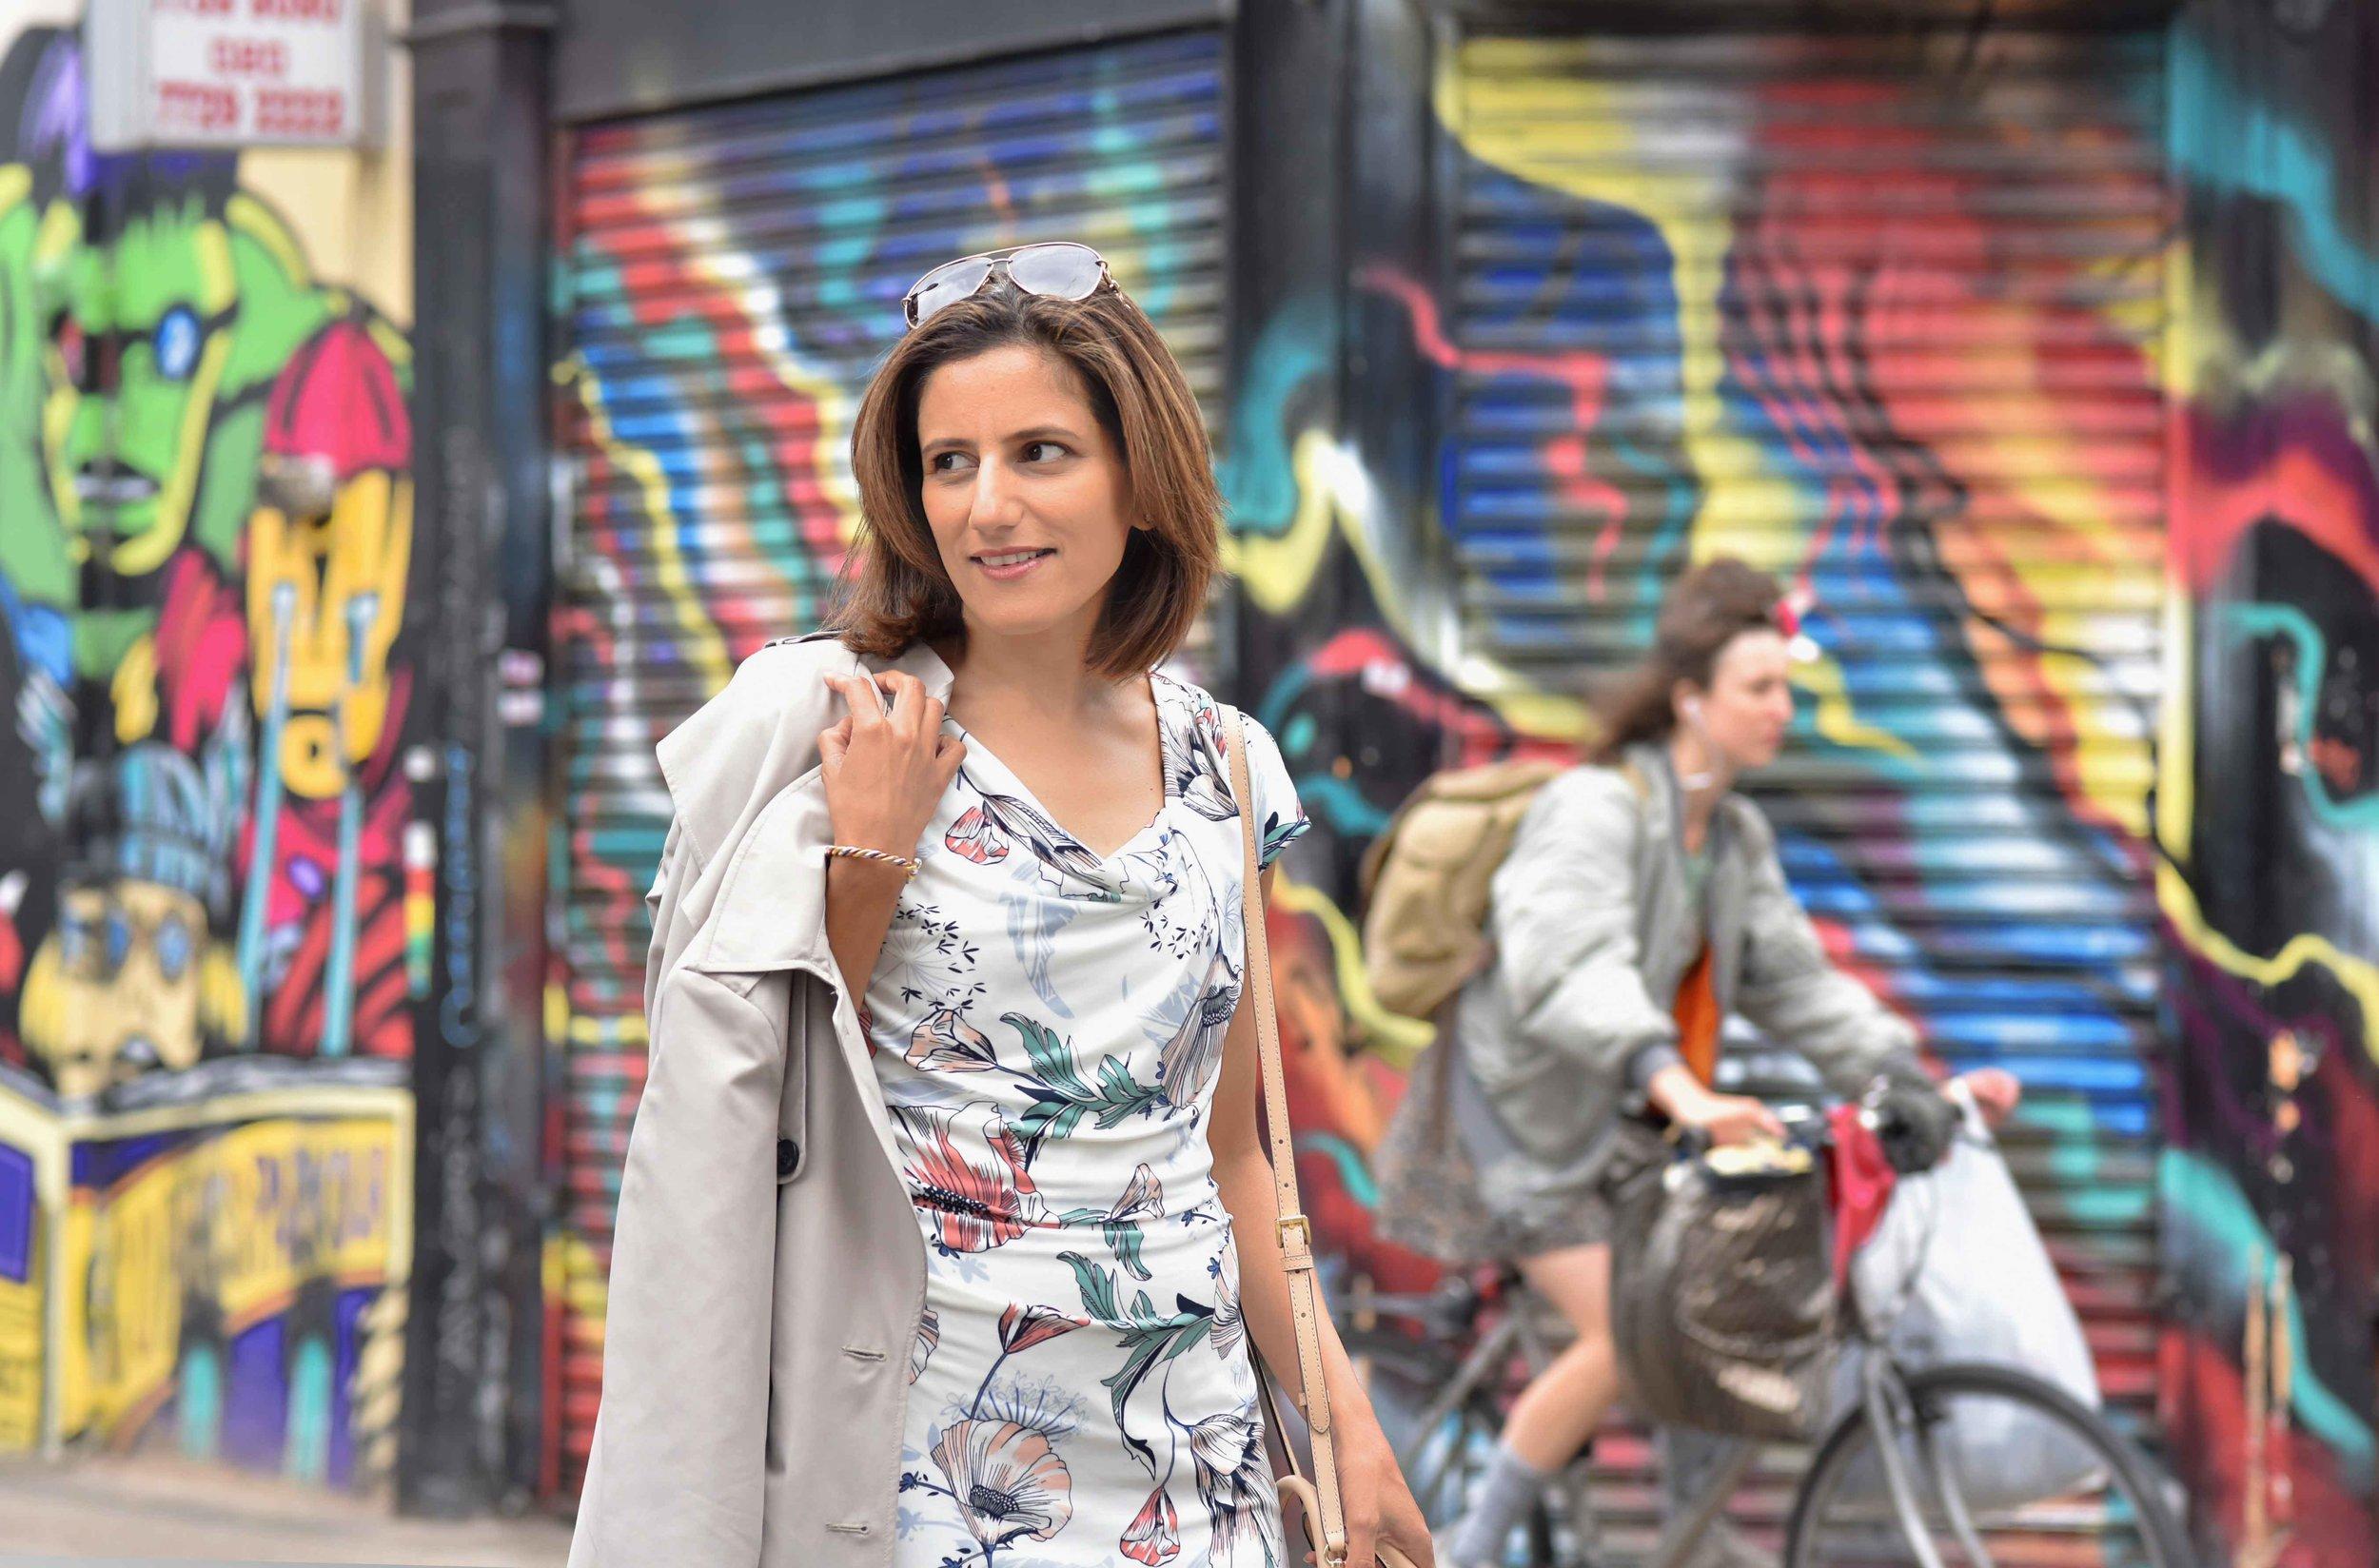 MNS shift dress, MNS trench, Graffiti artwork, street fashion, street art, Bricklane, Shoreditch, London, U.K. Photo: Nina Shaw, Image©sourcingstyle.com